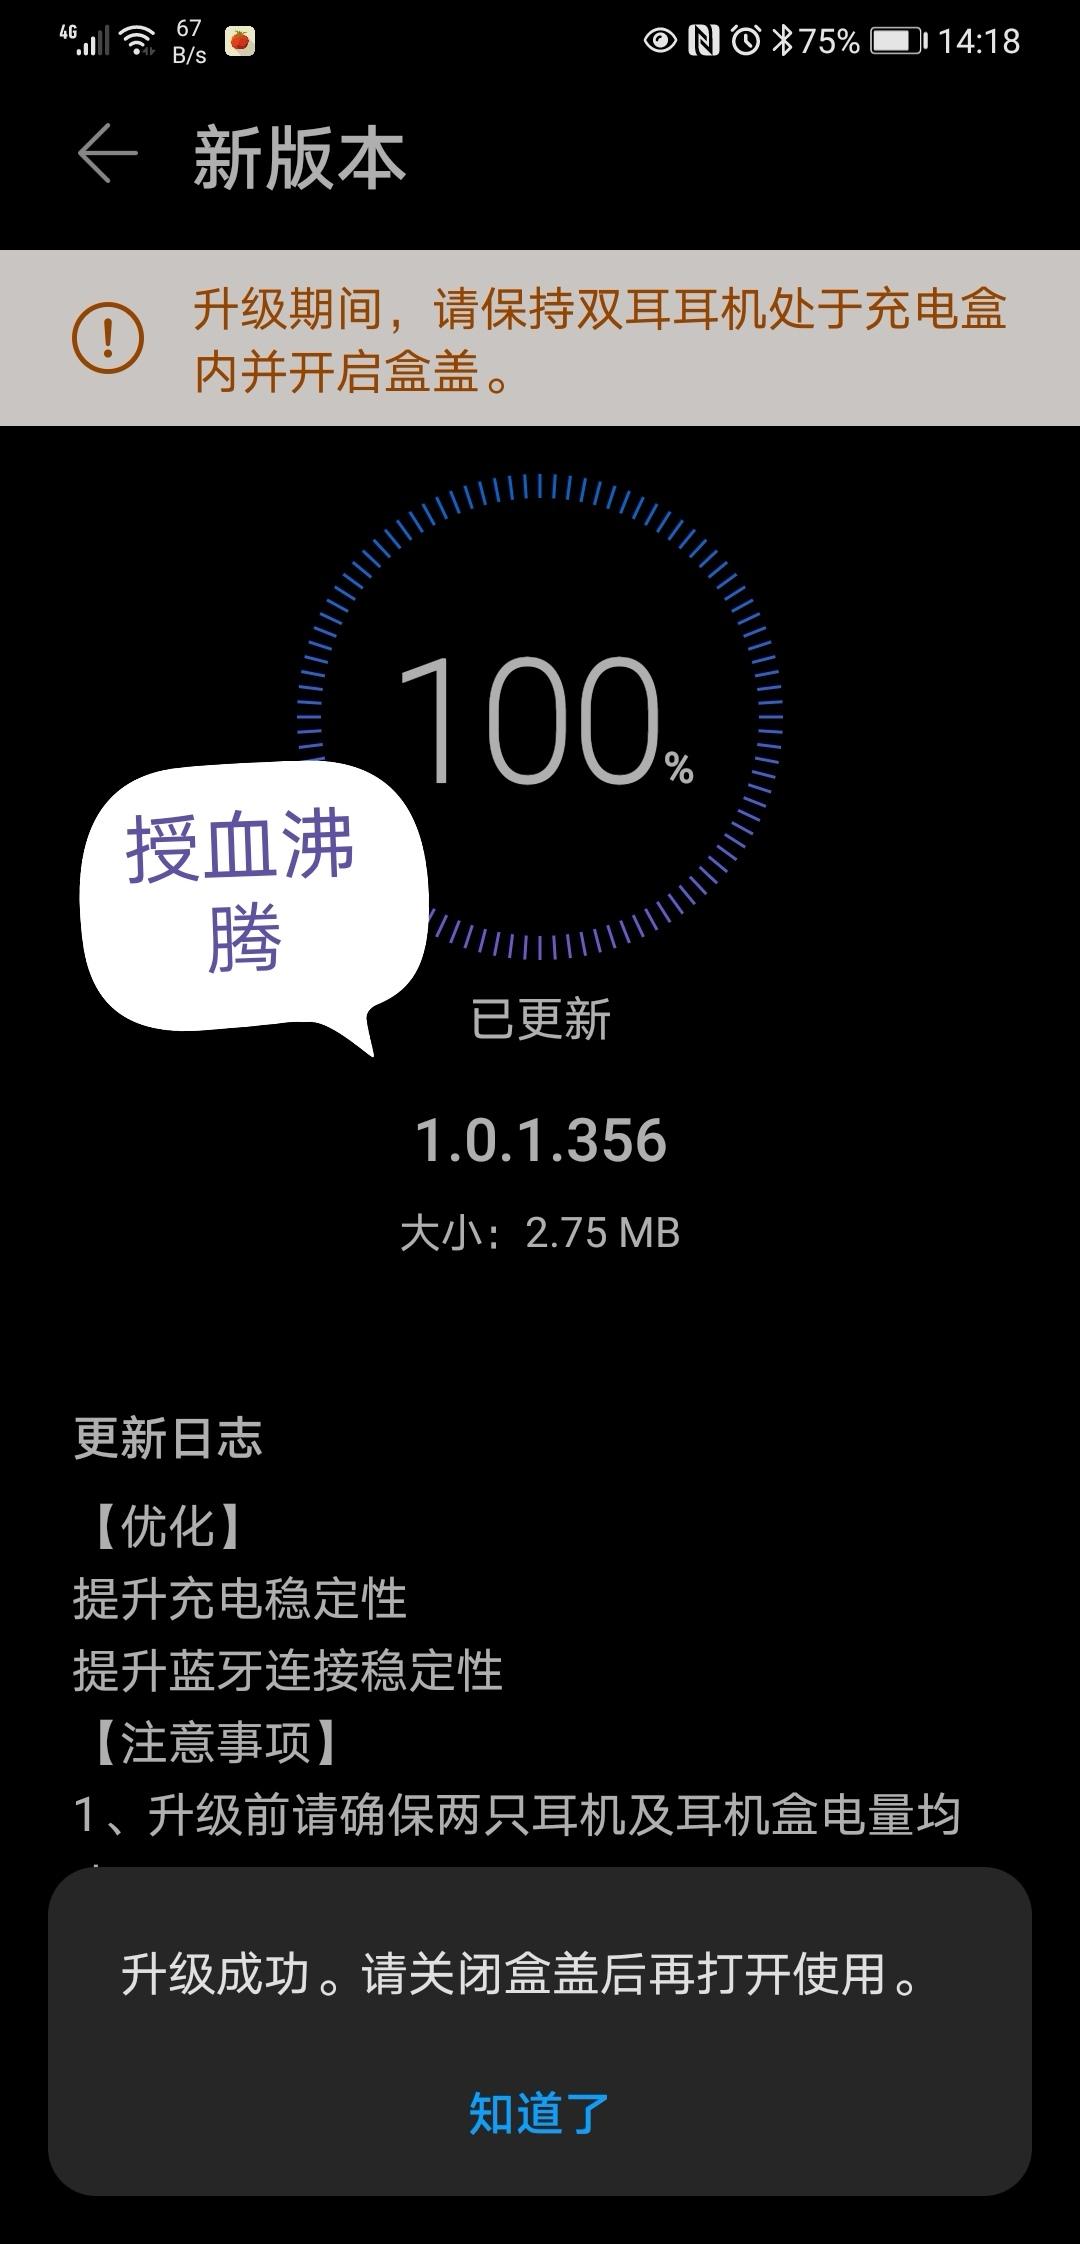 Screenshot_20210329_141855_com.huawei.smarthome_edit_23961137338010.jpg